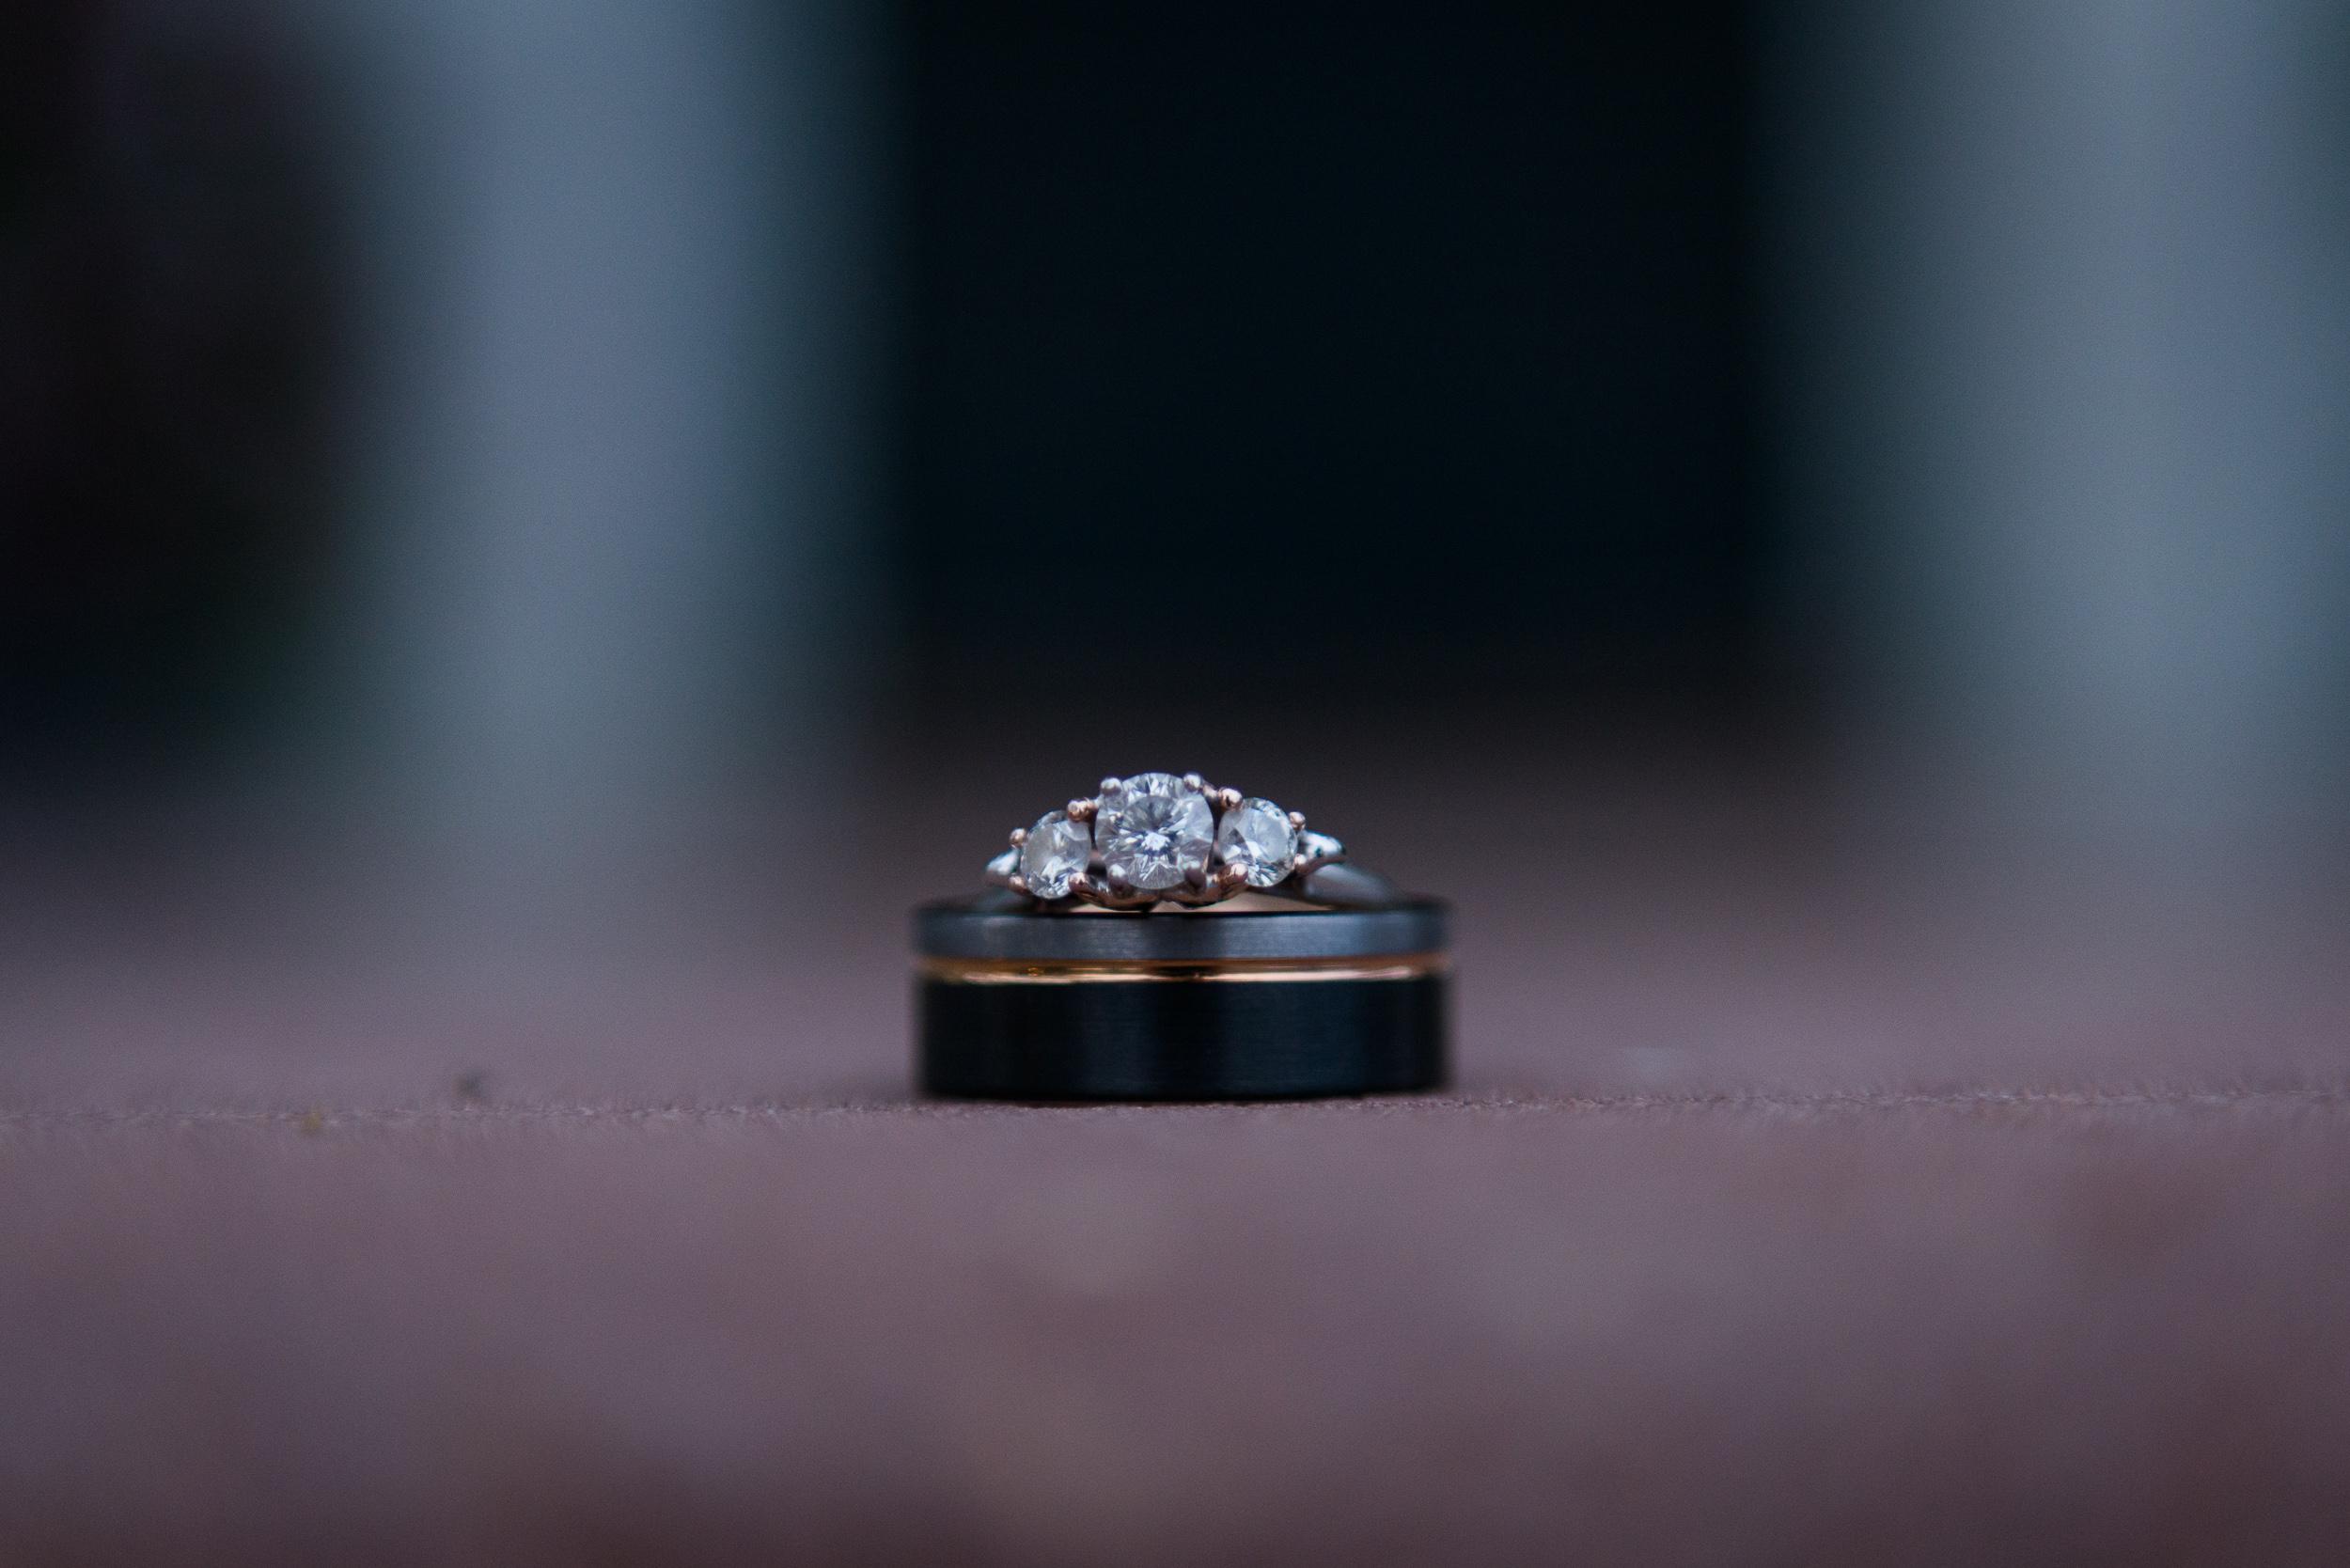 Macro shot of the wedding rings bridal details at Oatlands Historic House and Gardens in Leesburg, Virginia